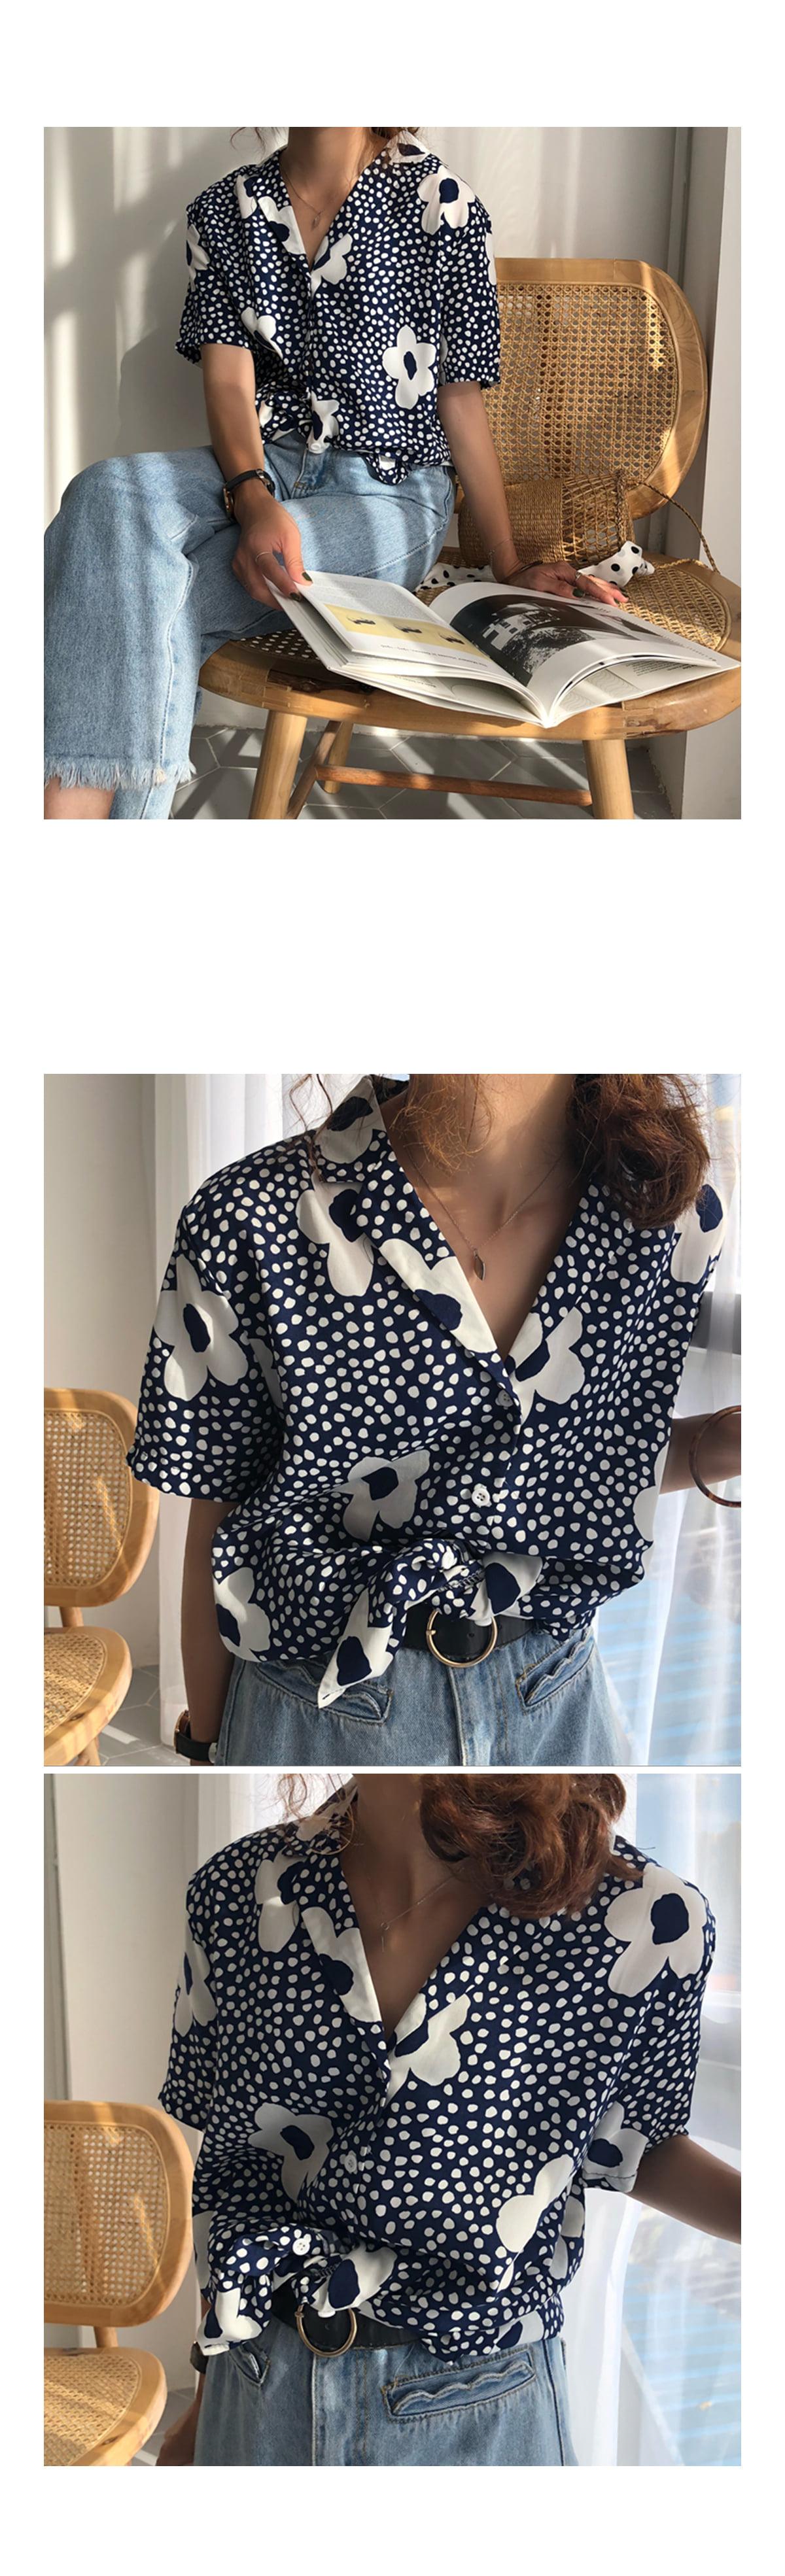 Moody Flower Shirt